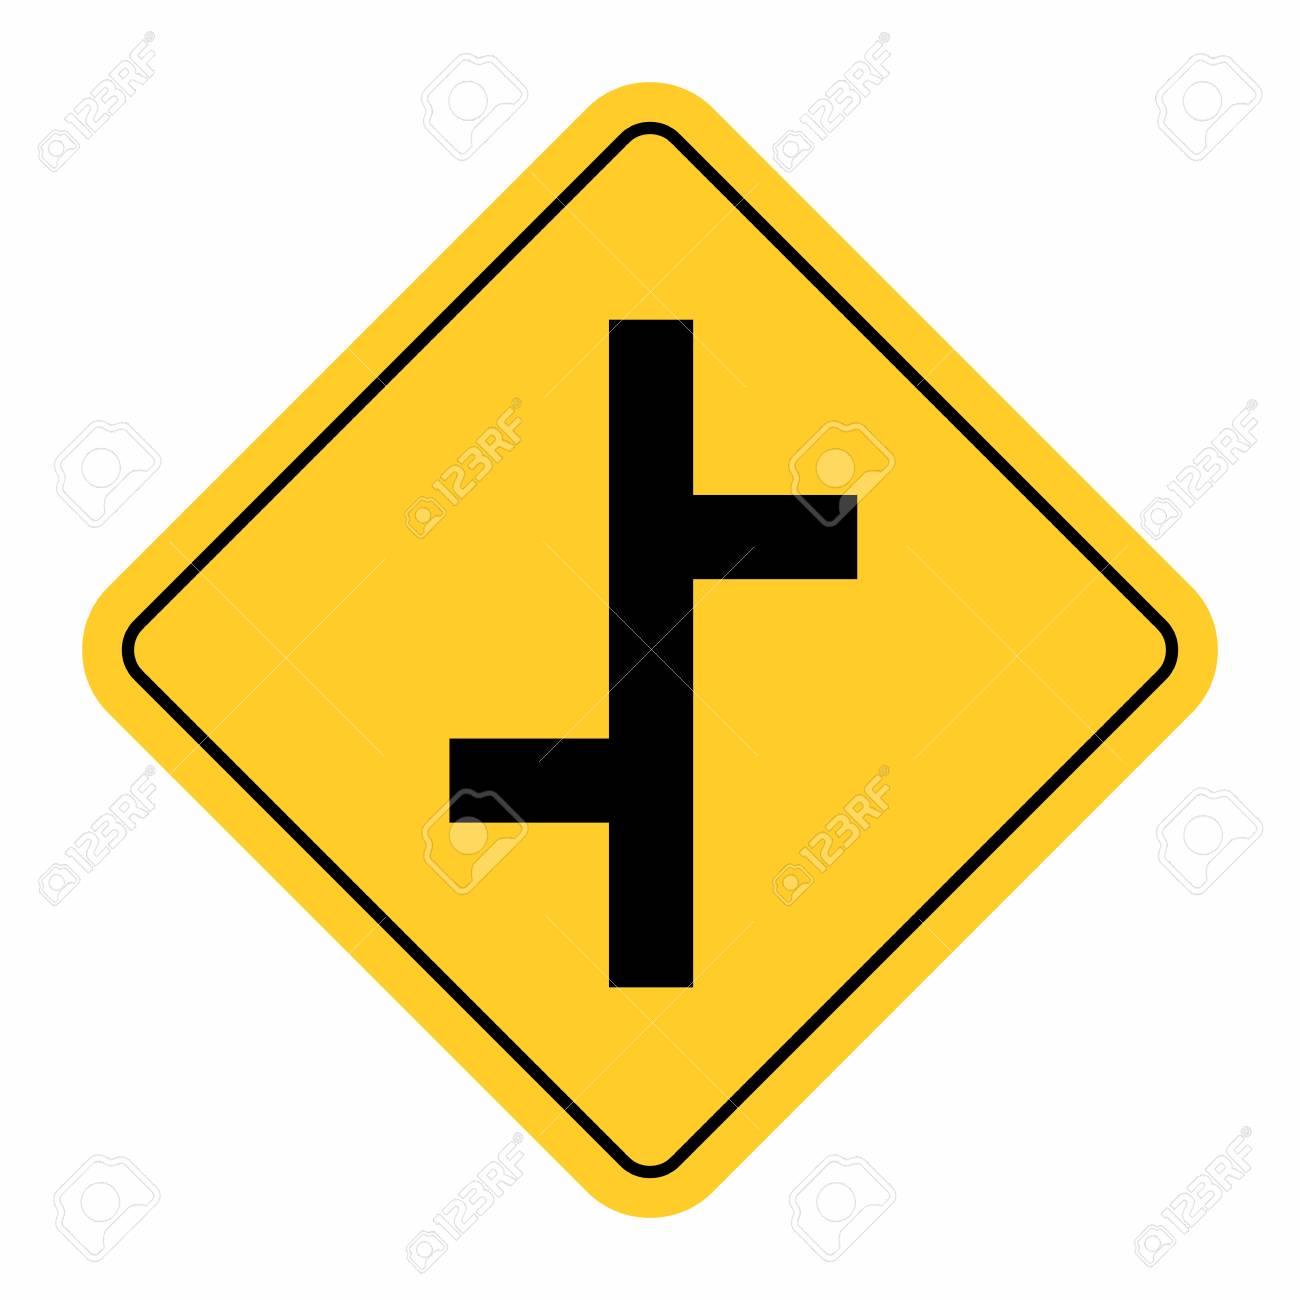 Junction Traffic Road Sign - 120766892